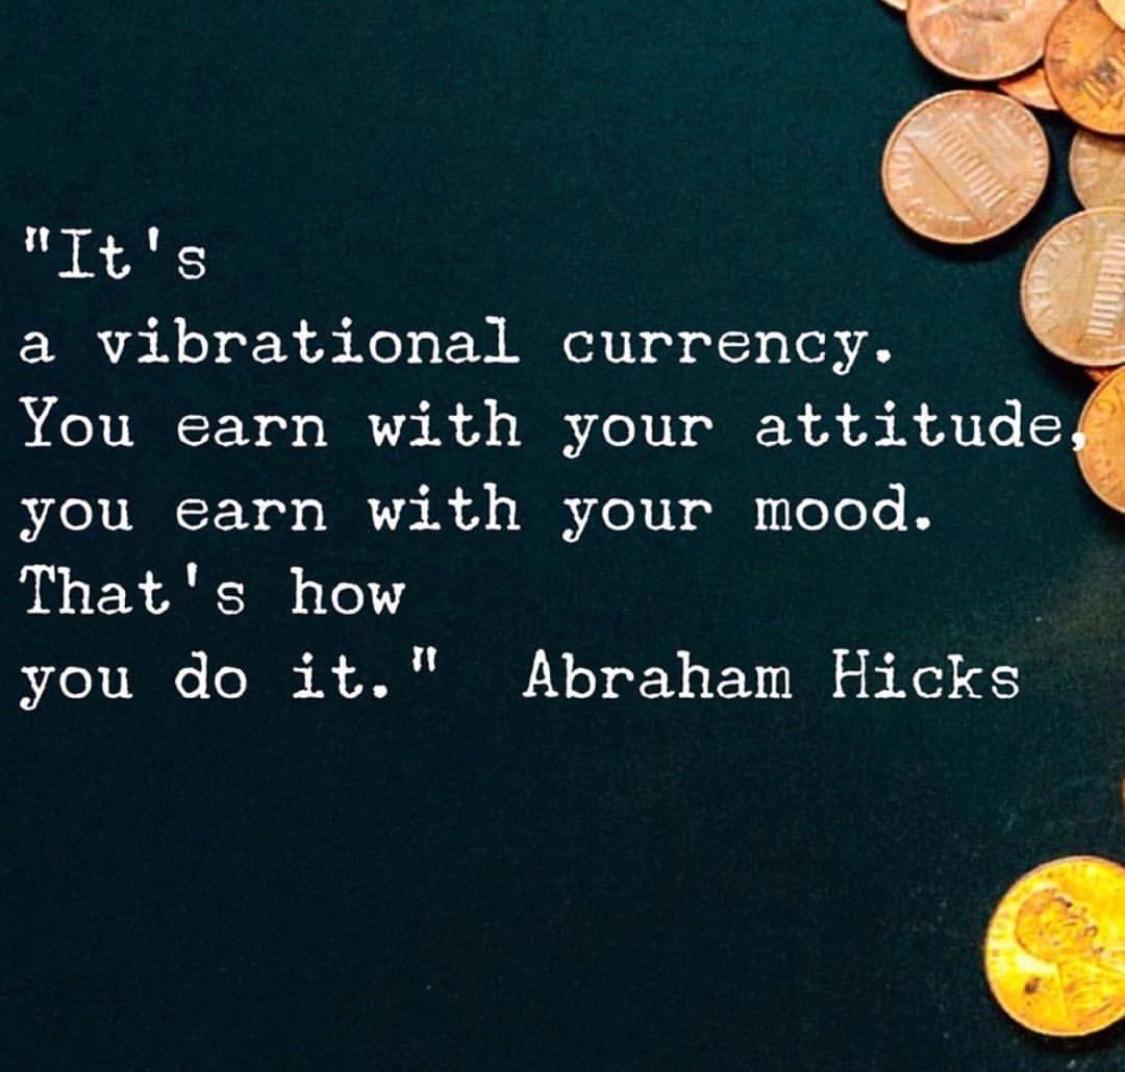 Abraham Hicks Quote - Crazy Blonde Life